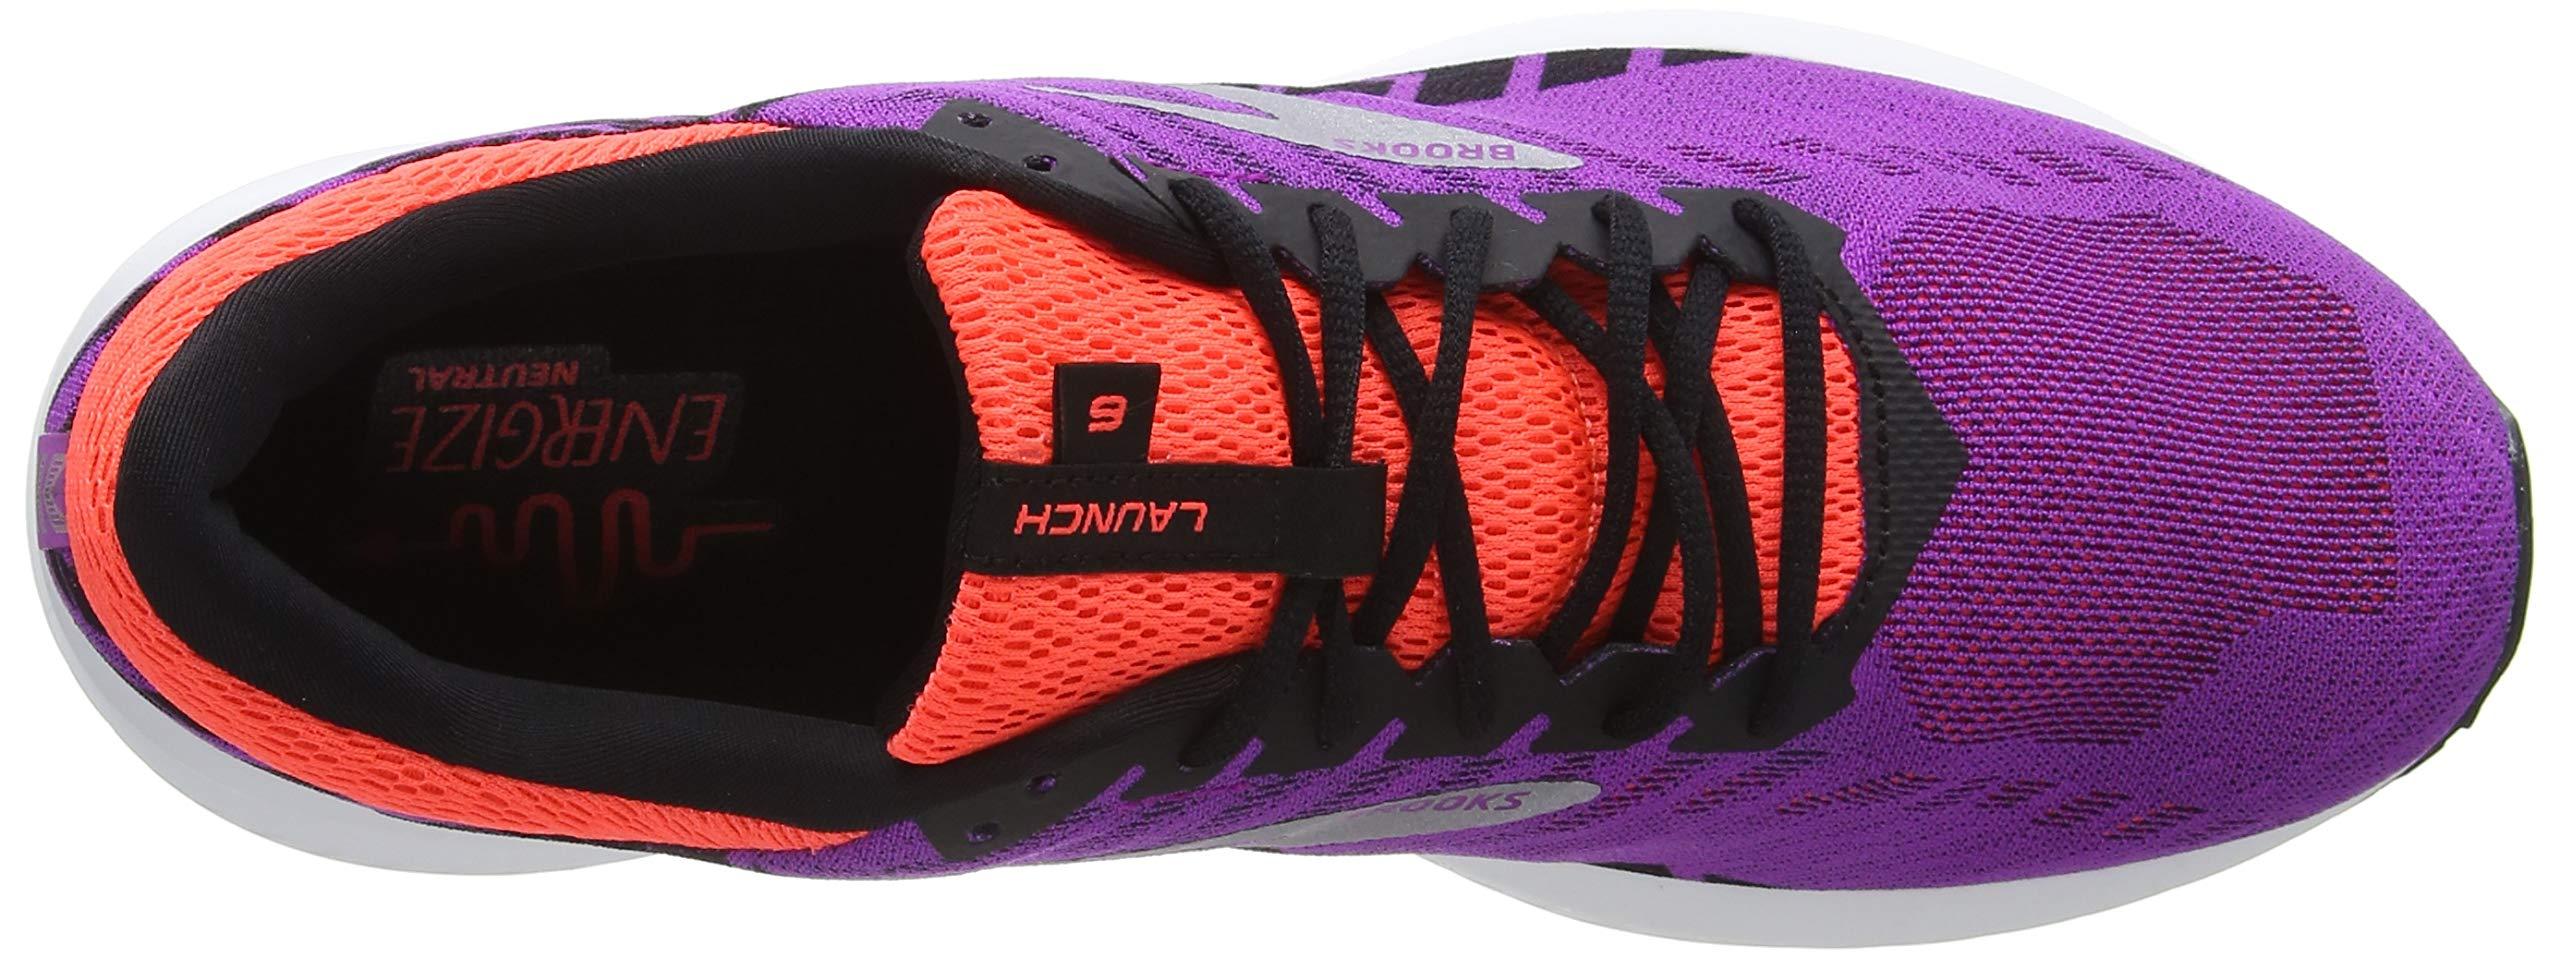 81ExgcS3CIL - Brooks Women's Launch 6 Running Shoes